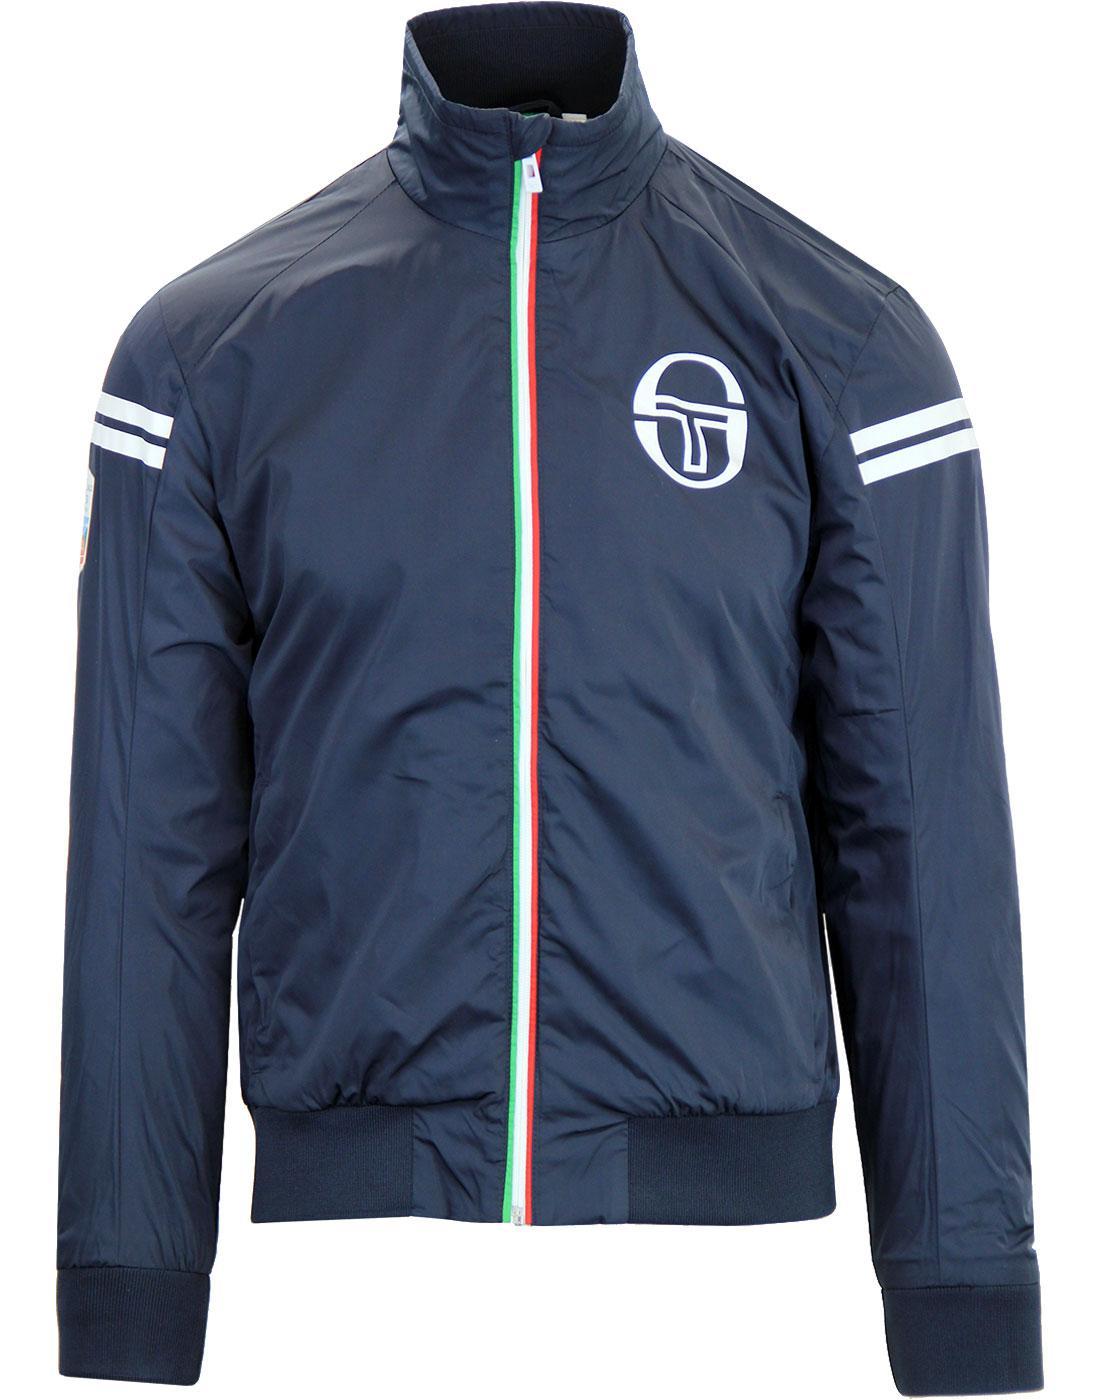 SERGIO TACCHINI Monte Carlo Tennis Staff Jacket